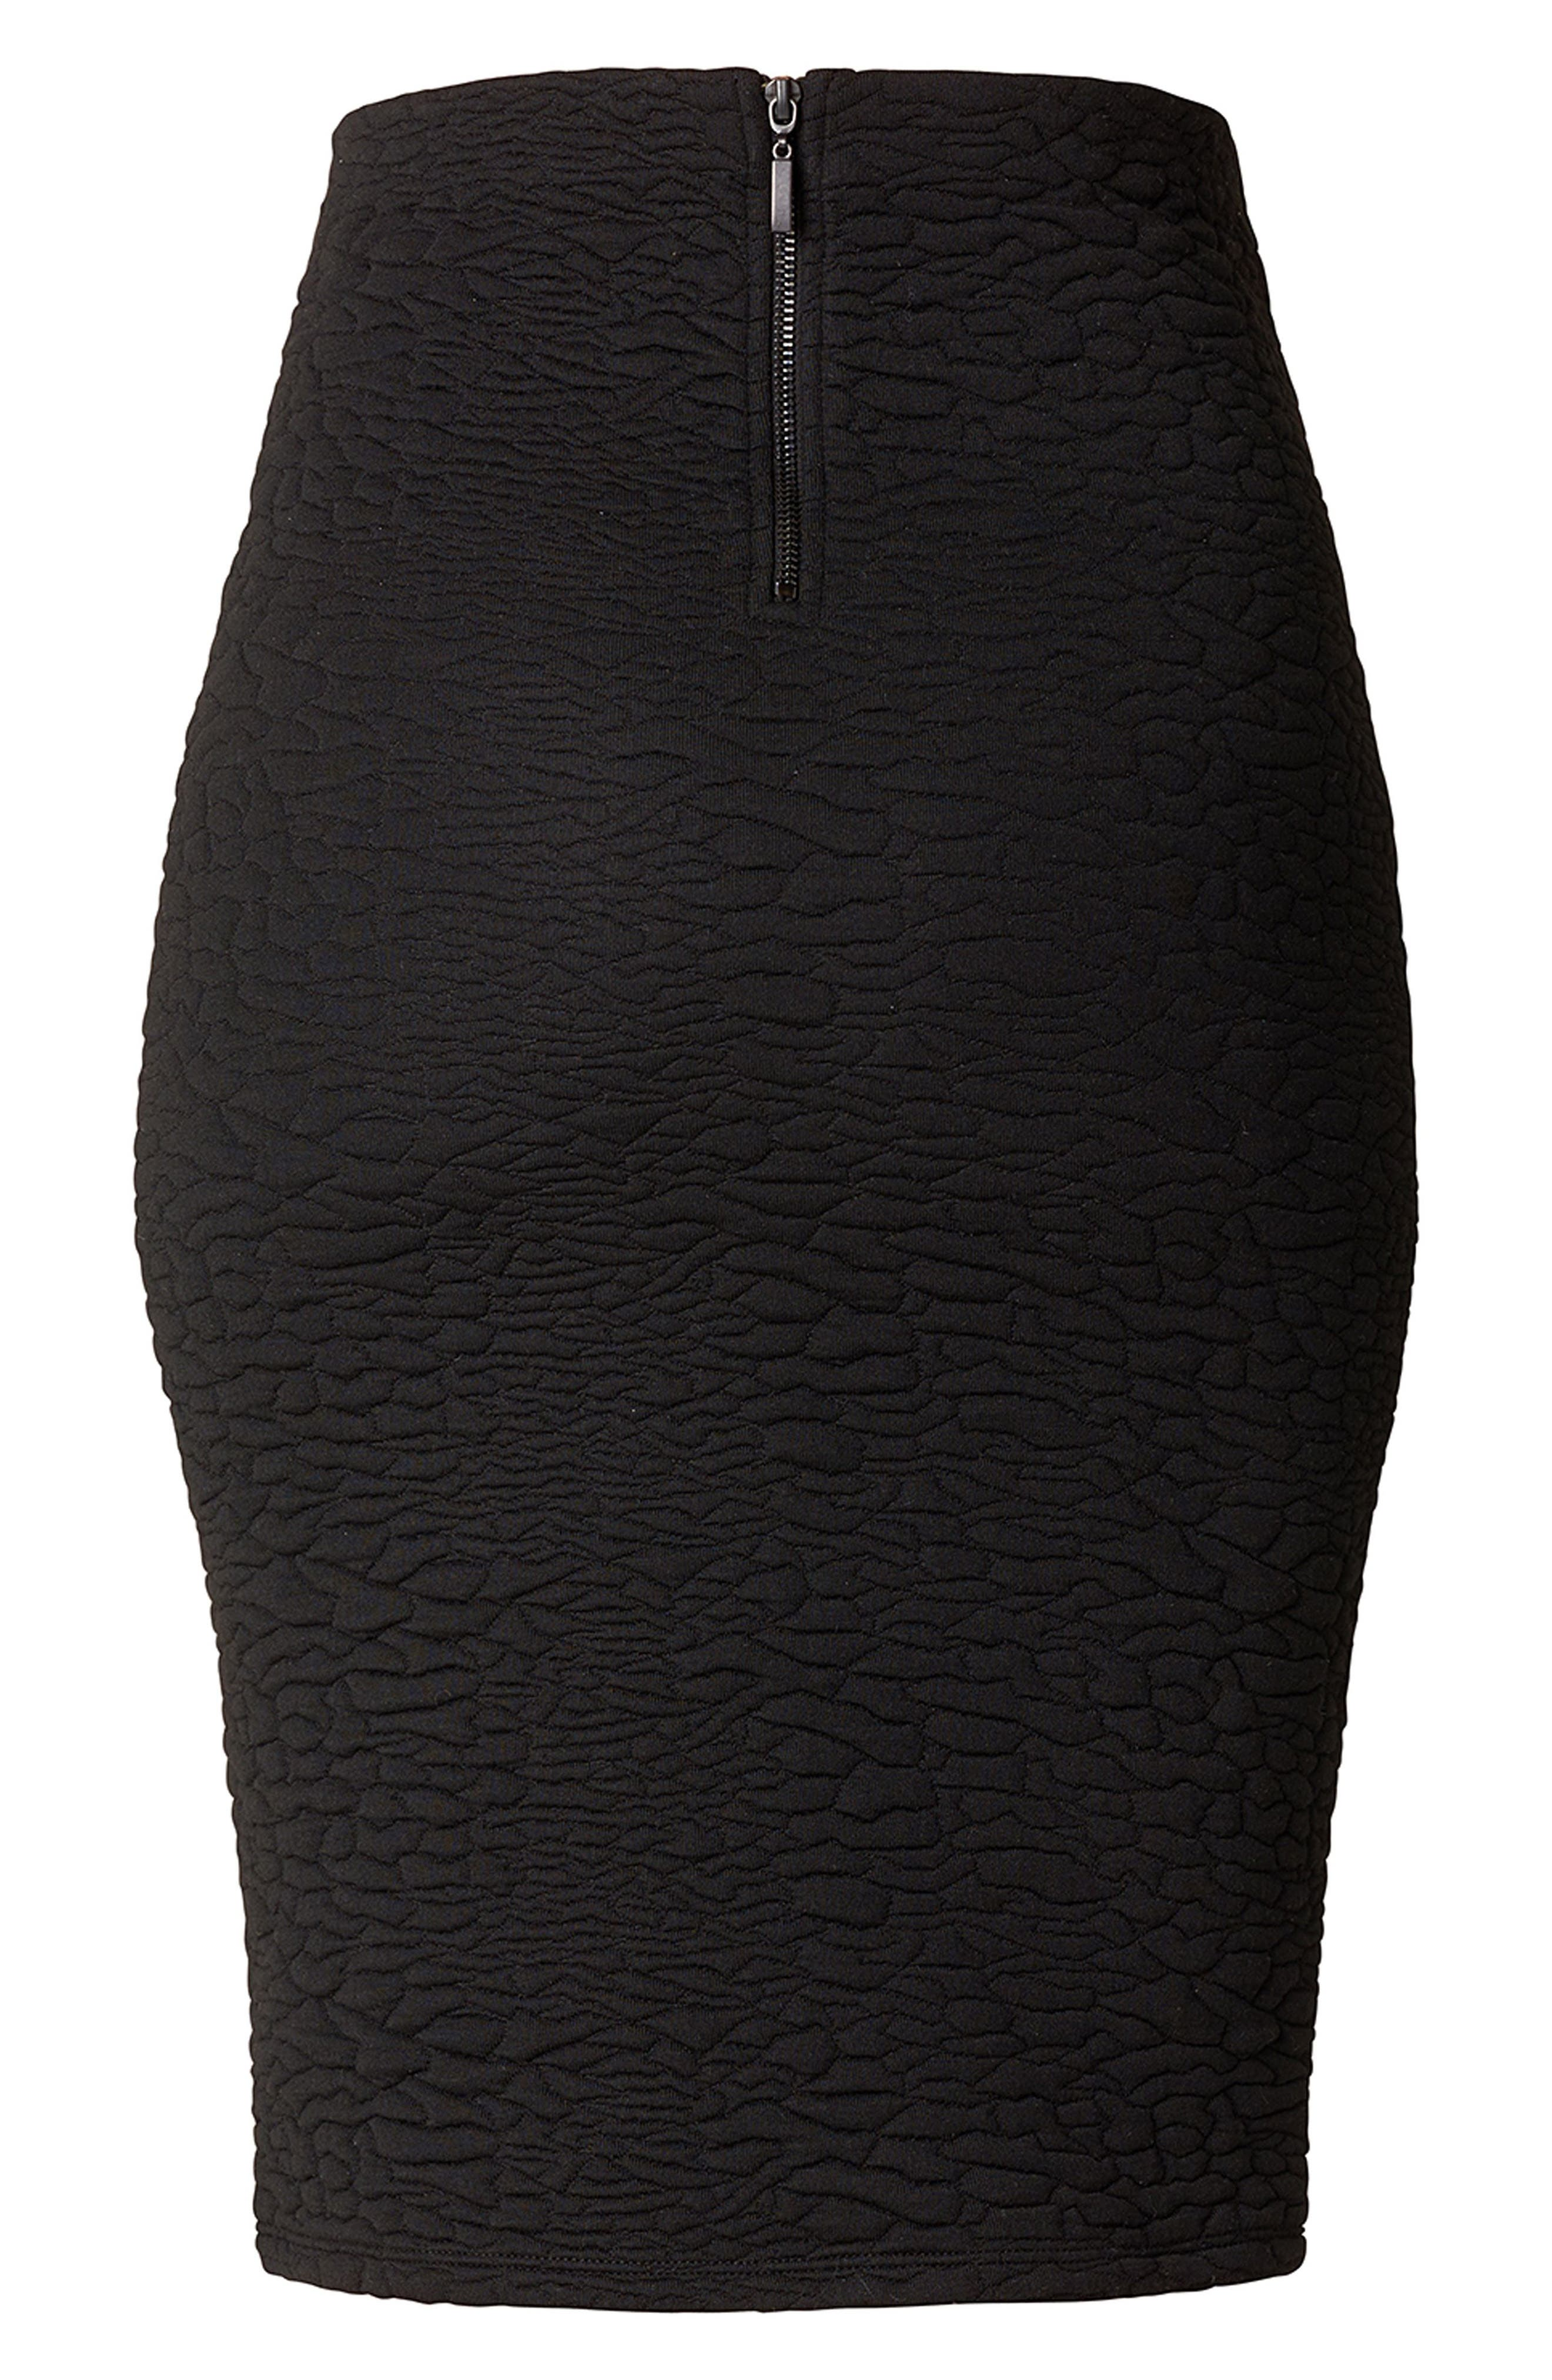 Jane Textured Knit Maternity Skirt,                             Alternate thumbnail 3, color,                             BLACK